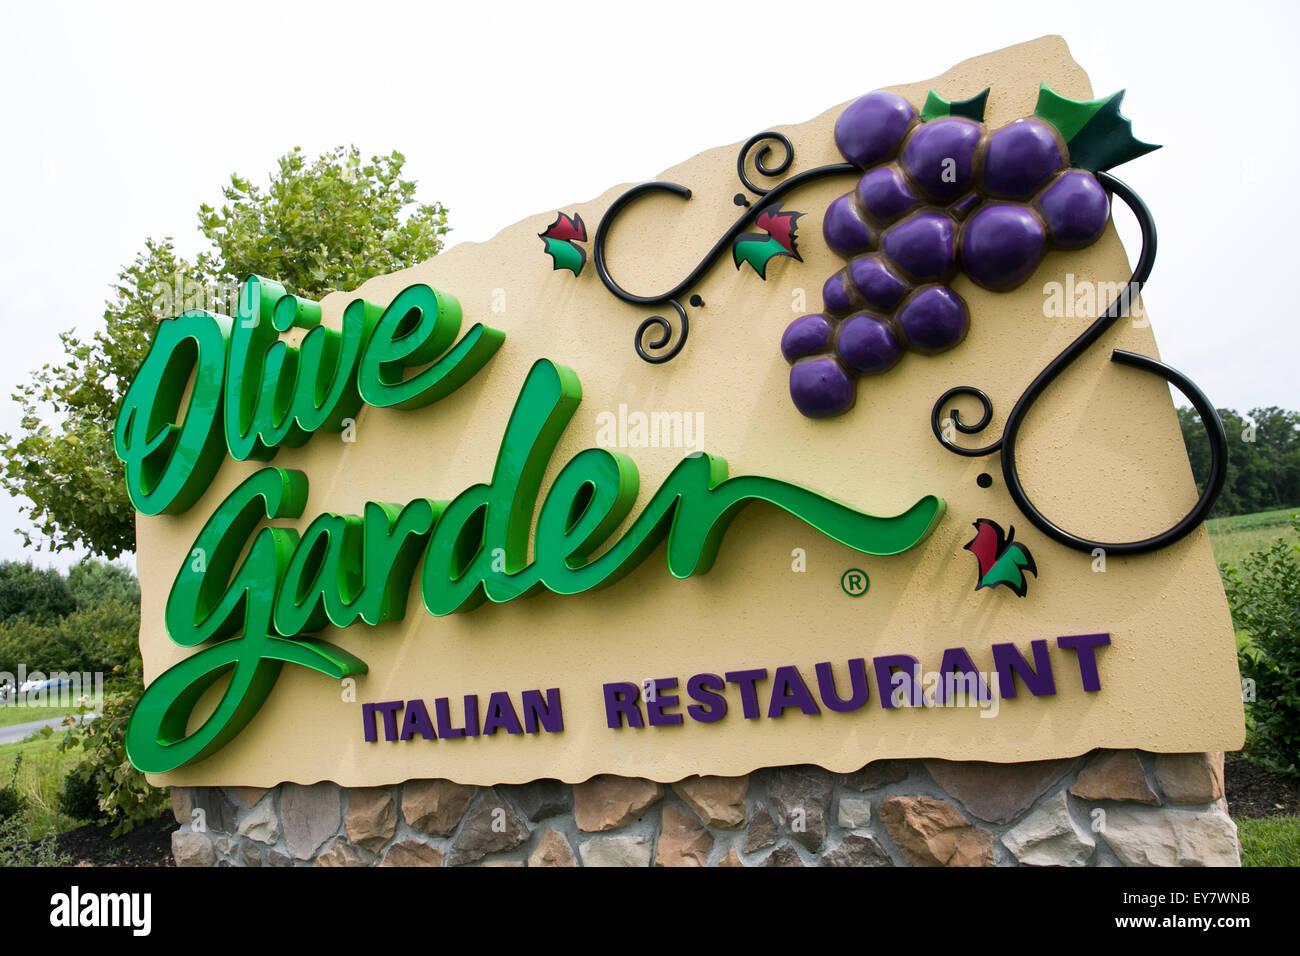 Olive Garden Restaurant Stock Photos & Olive Garden Restaurant Stock ...